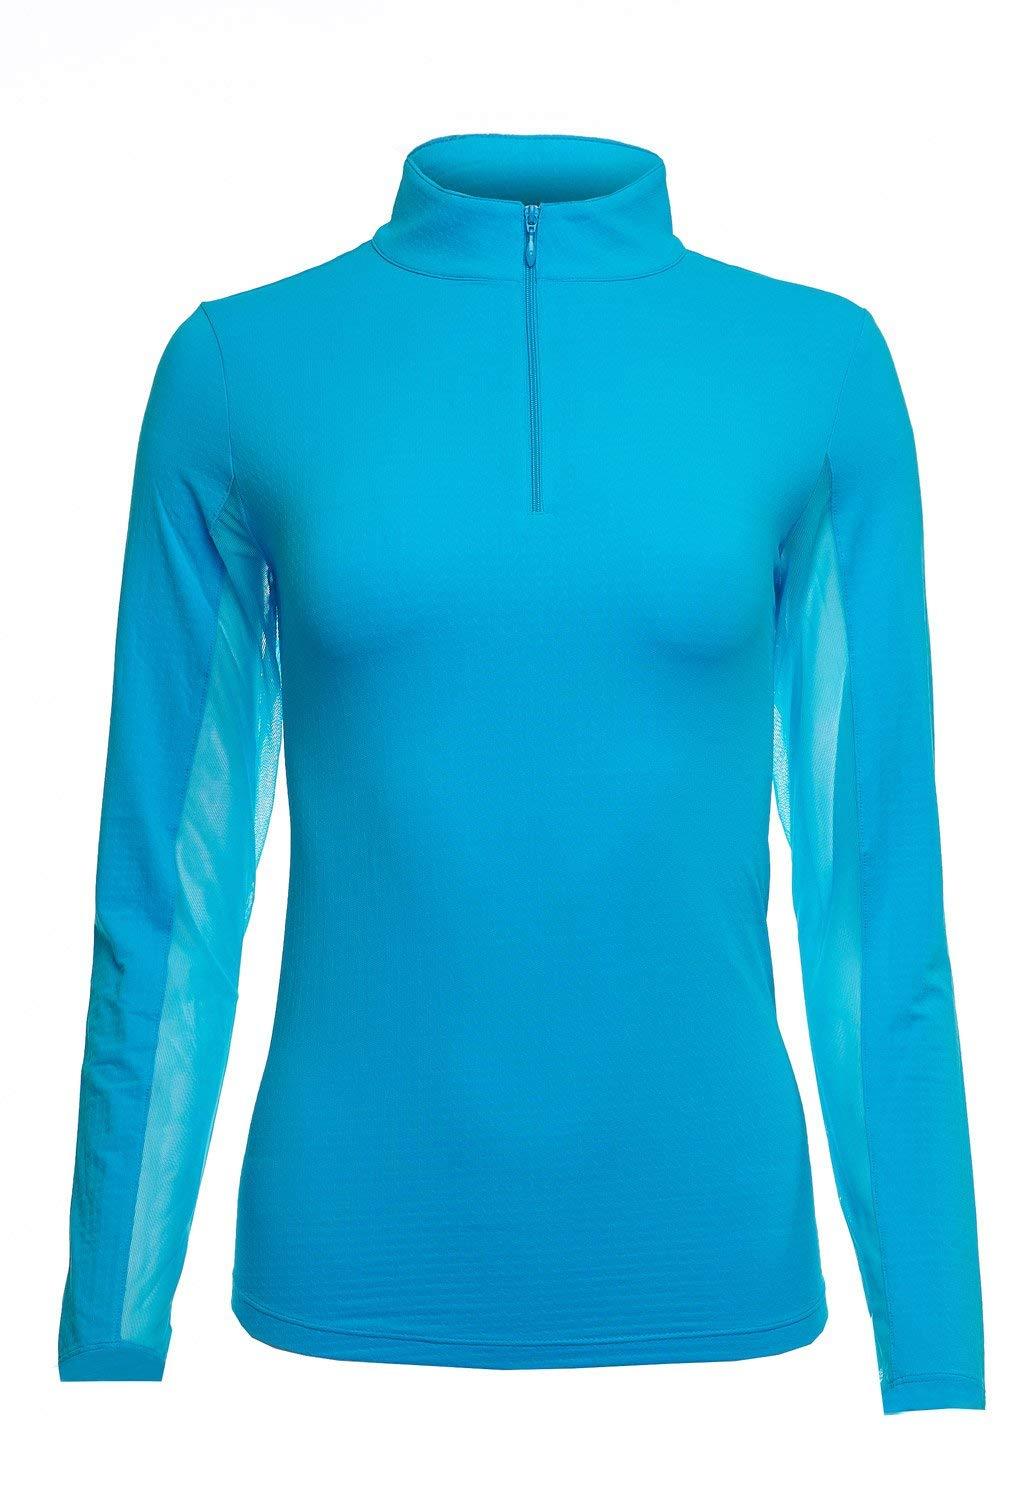 IBKUL Long Sleeve Zip Mock Sun Shirt Womens (Turquoise, Medium) by IBKUL